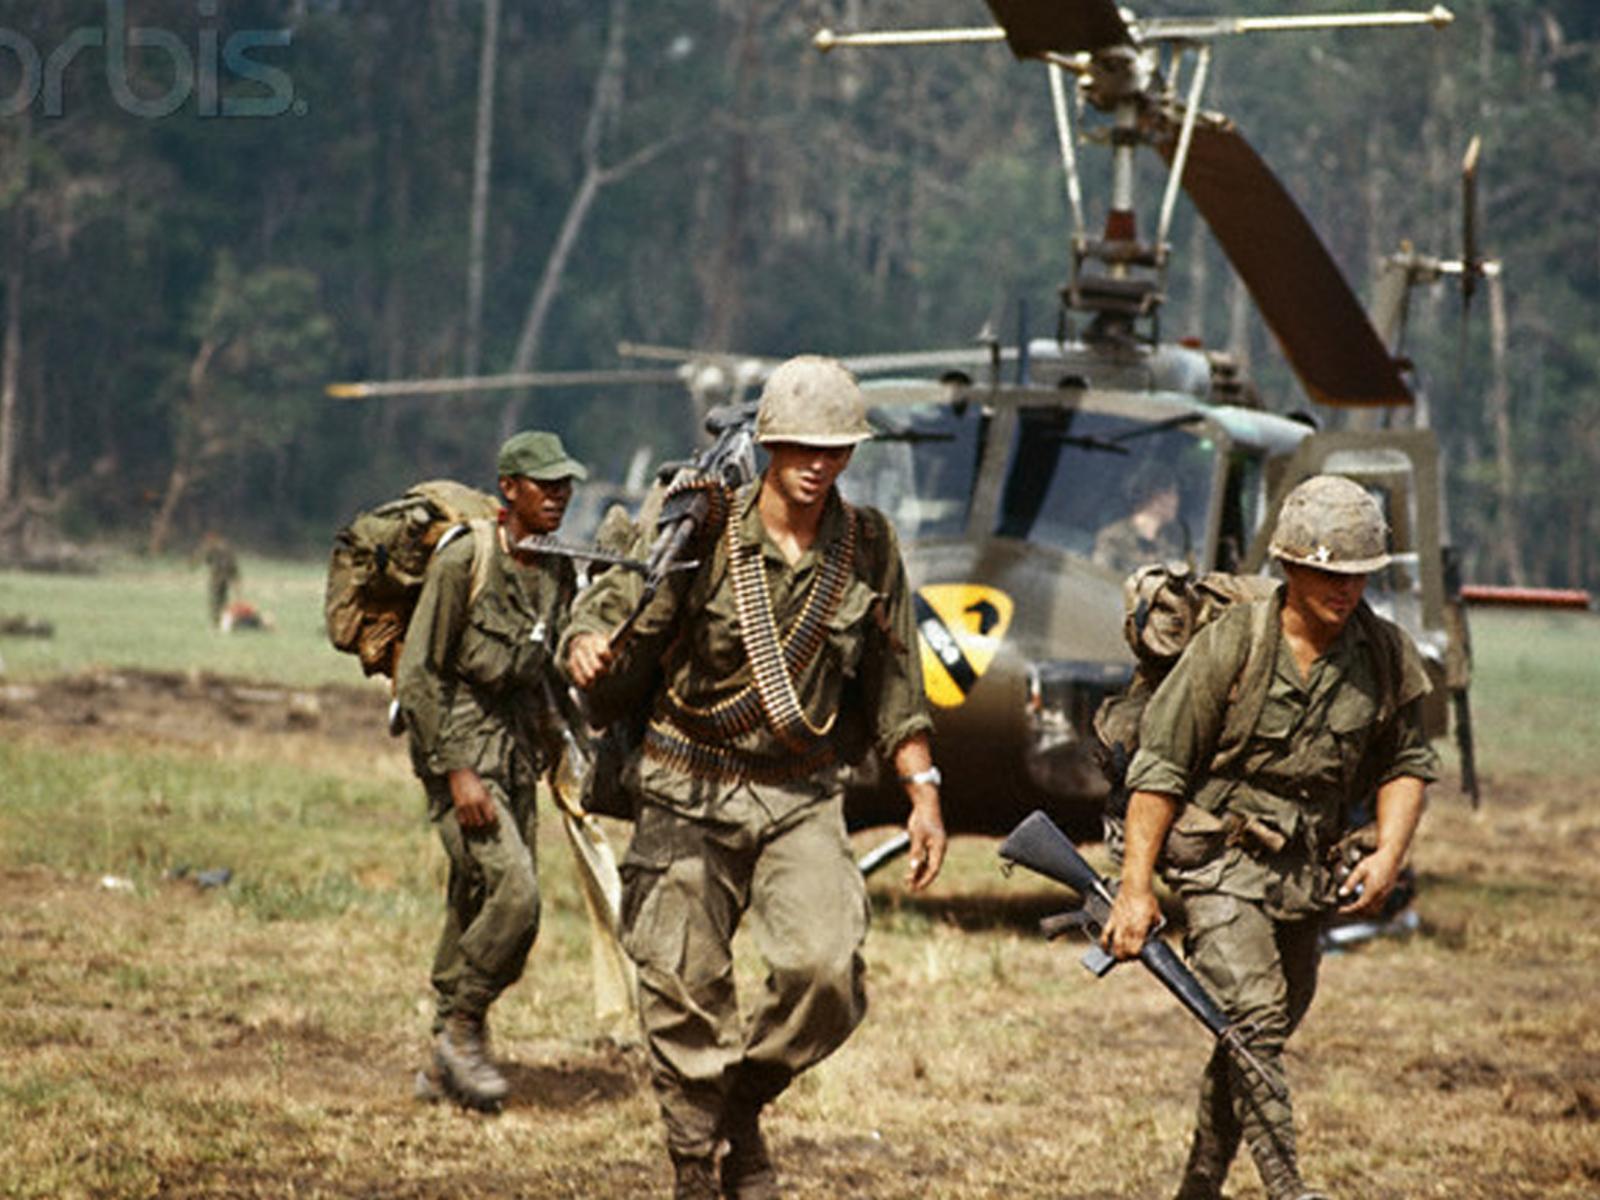 Vietnam War Wallpapers Desktop 1600x1200 px   4USkY 1600x1200